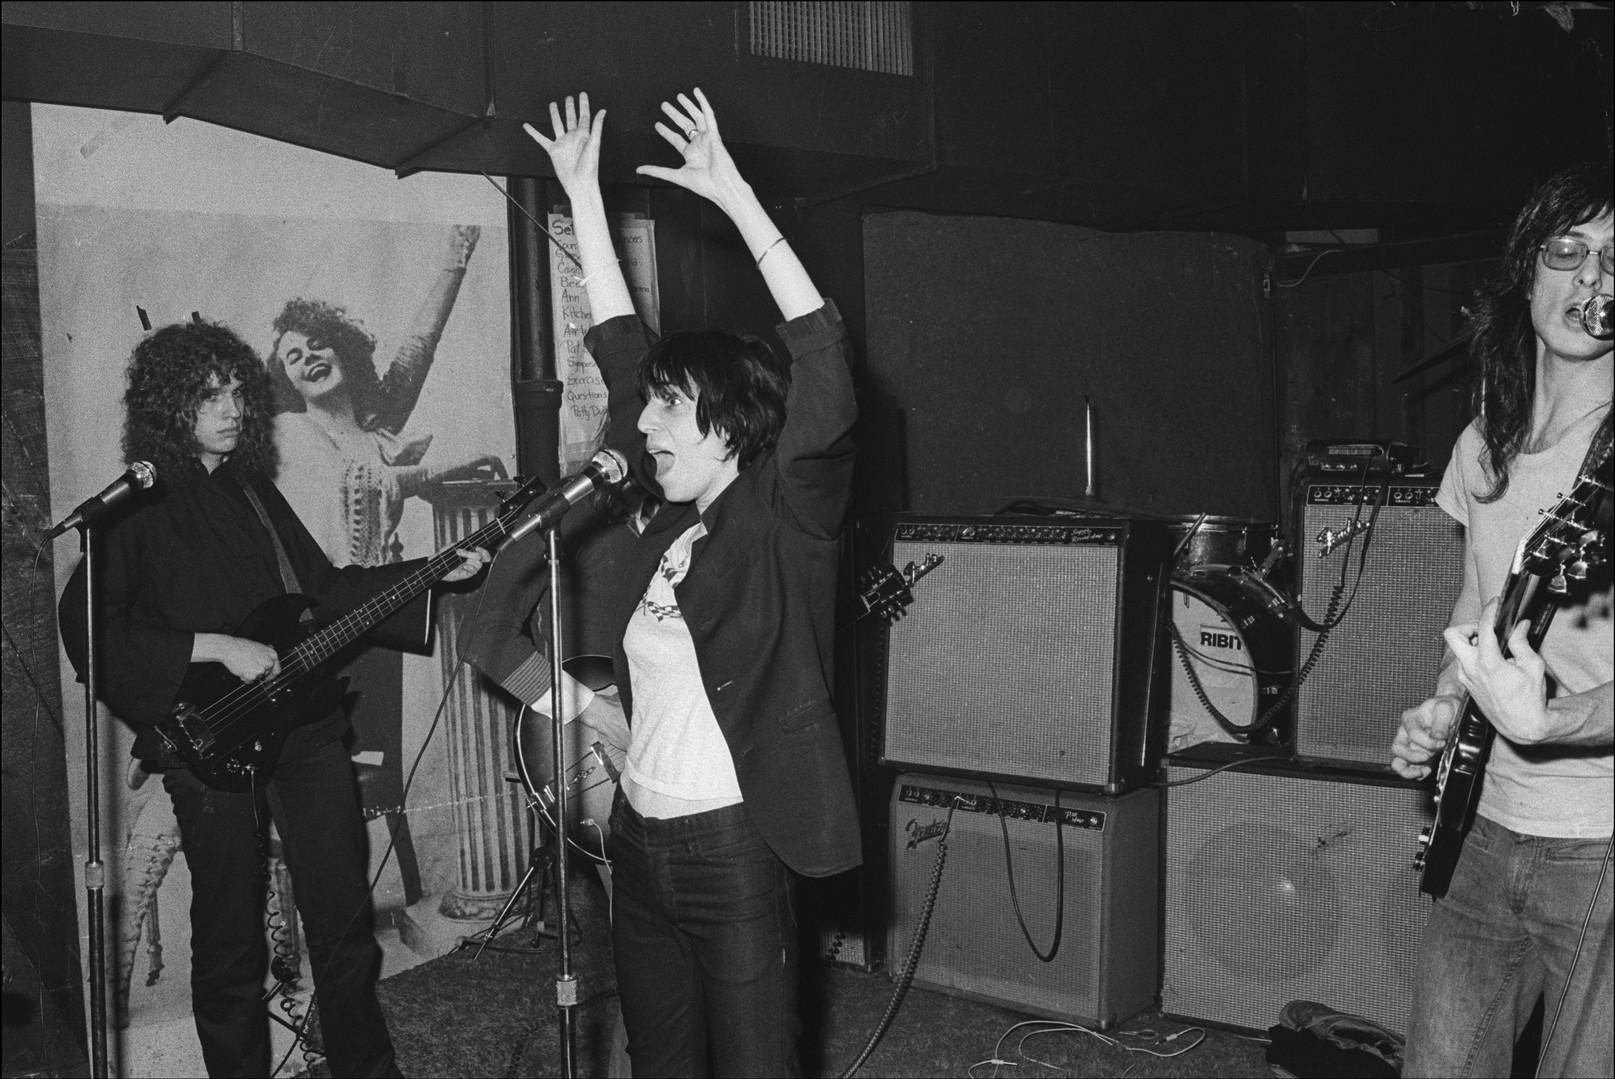 Patti_Smith_CBGB_Hands_Up.jpg